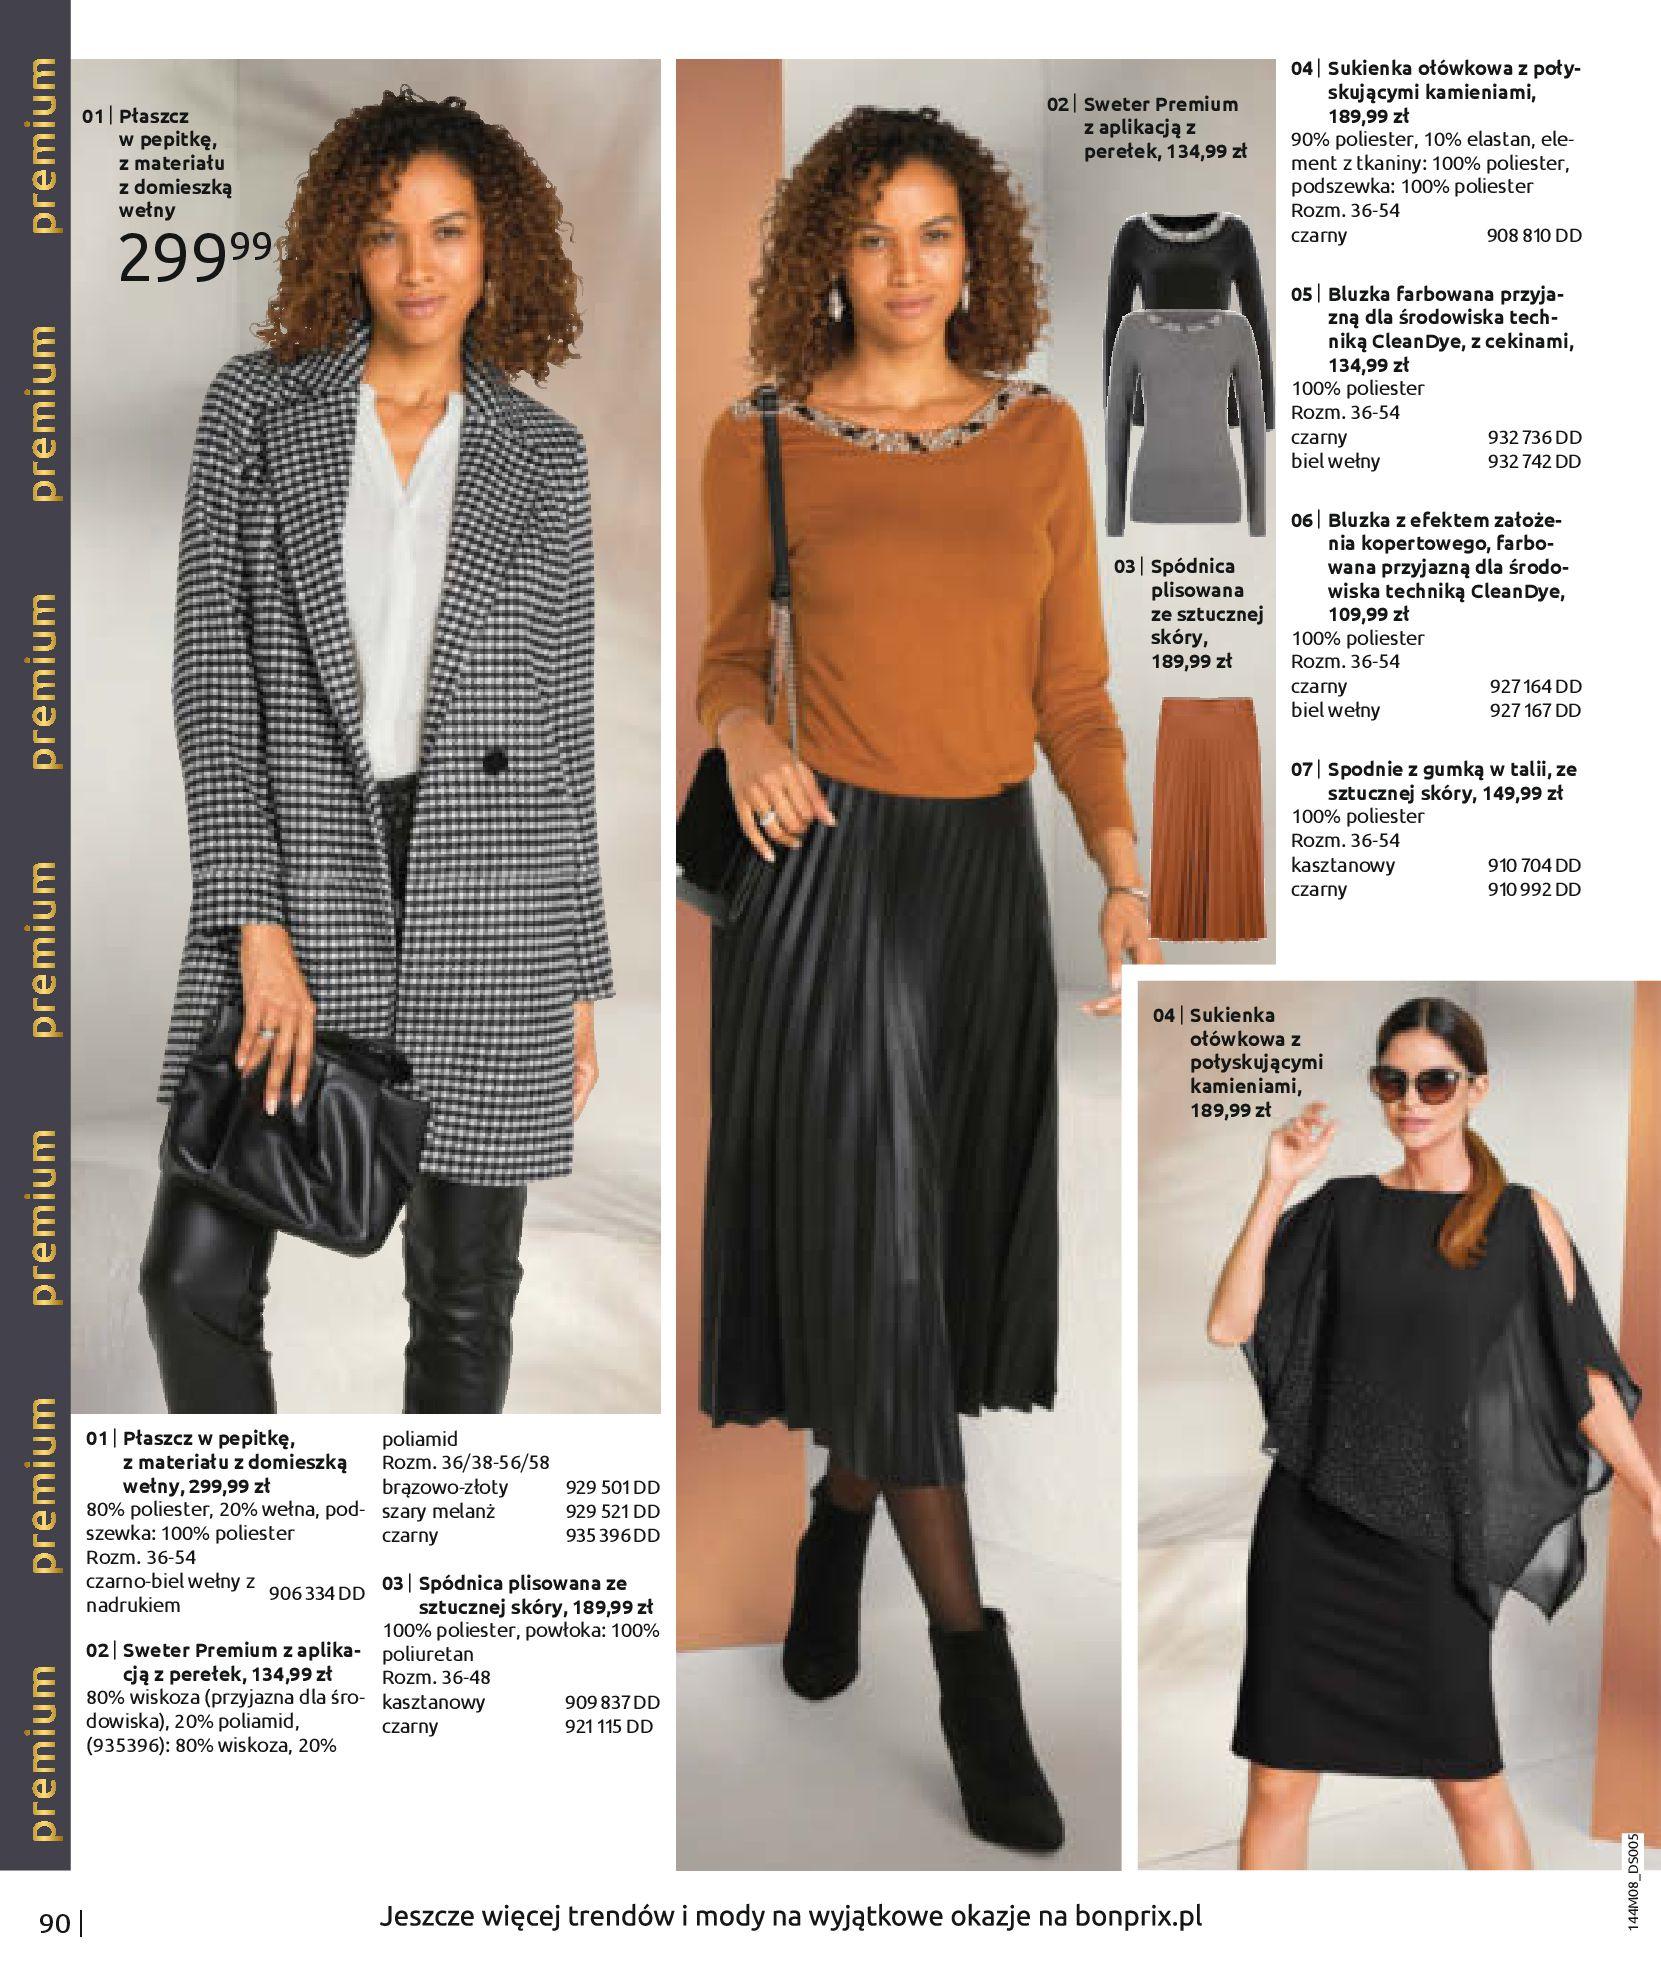 Gazetka Bonprix: Katalog Bonprix - denim 2021-09-09 page-92